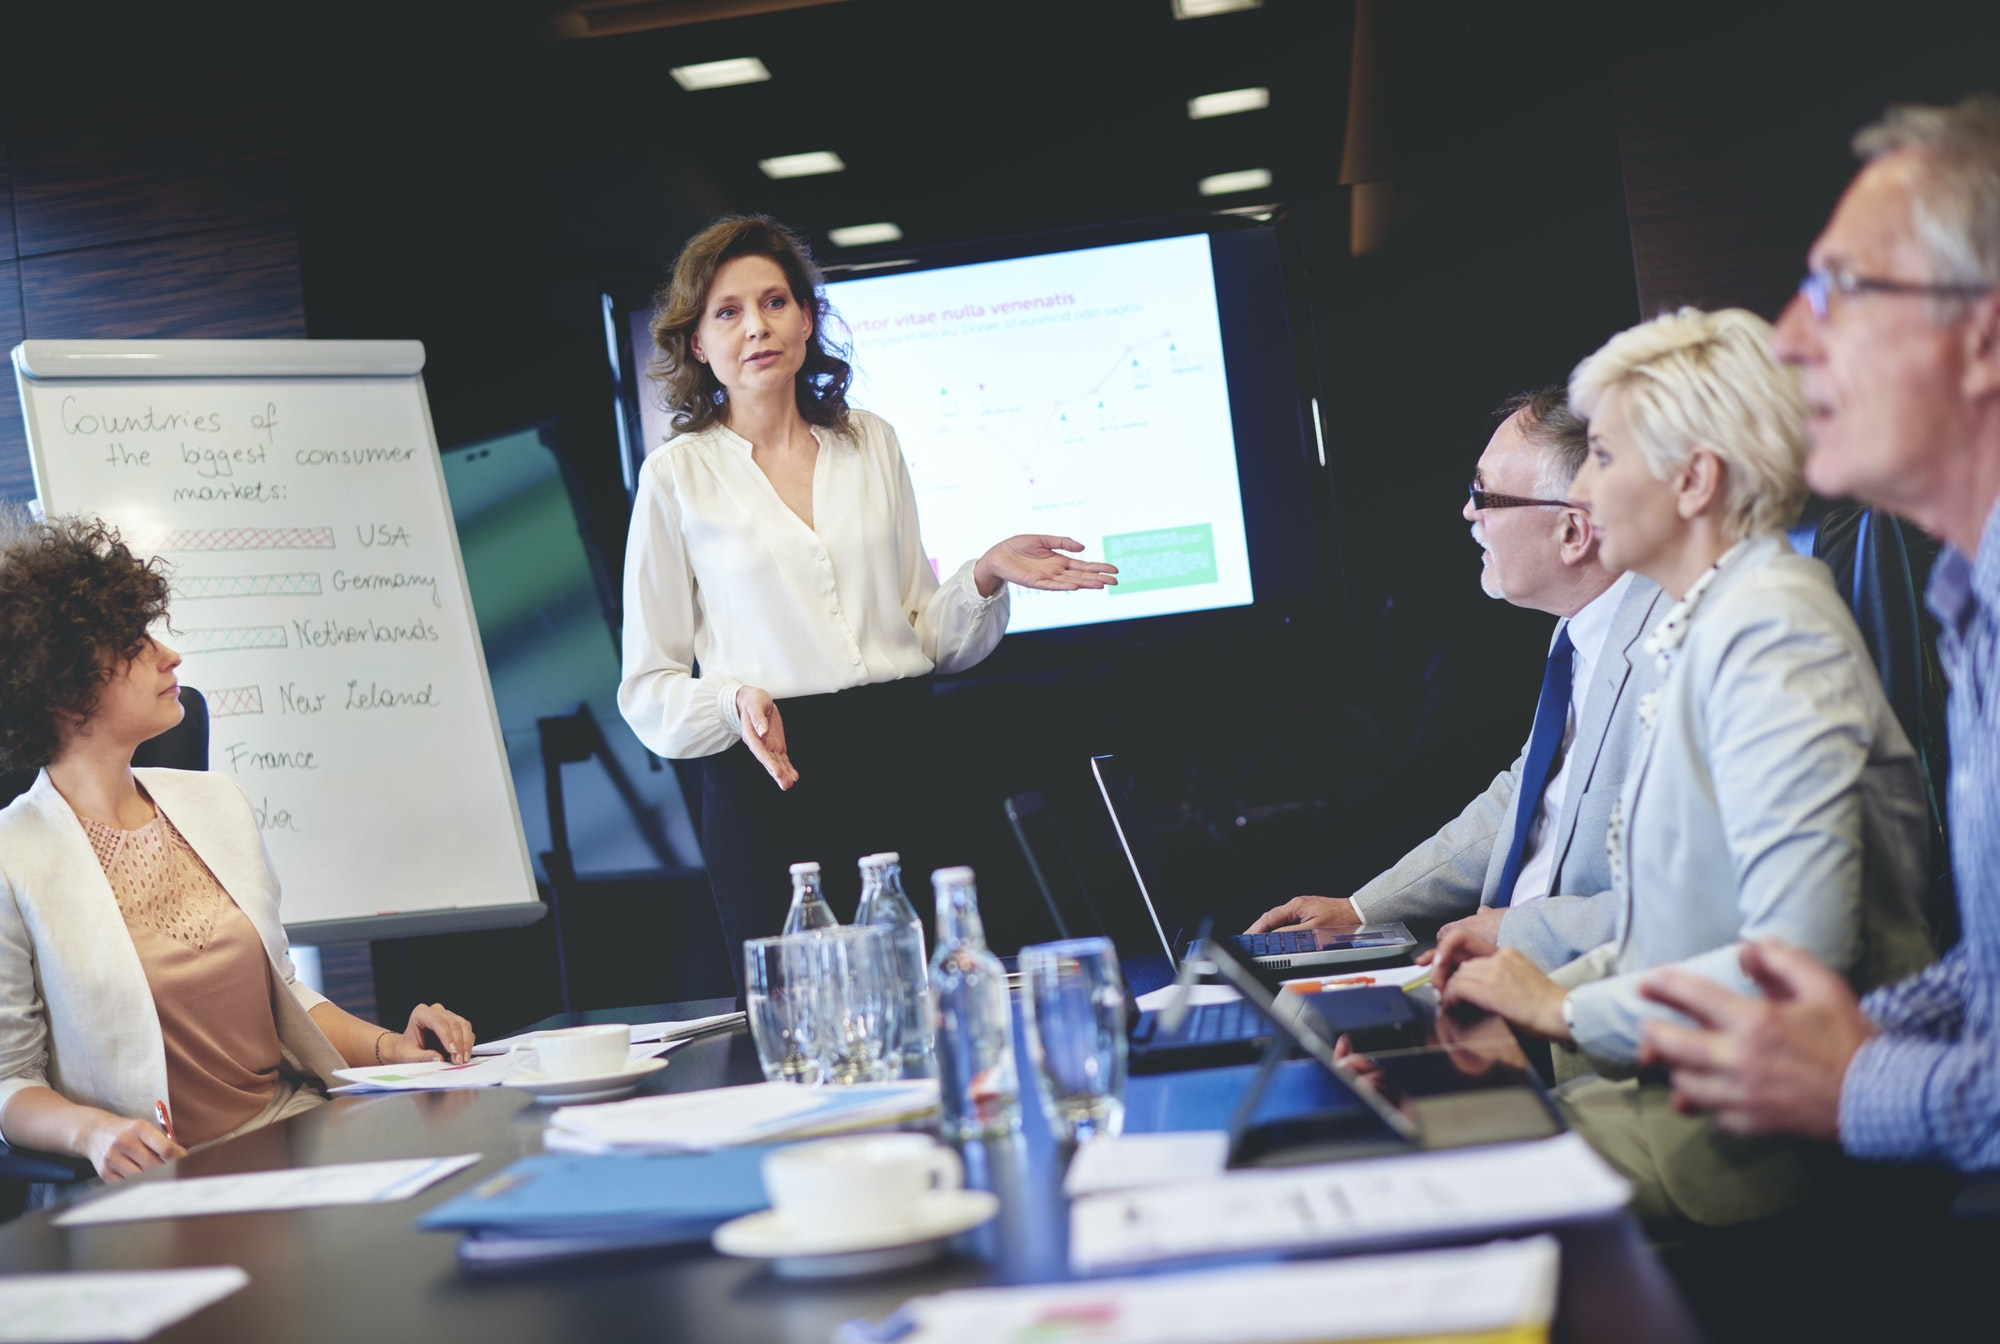 Female public speaker over conference